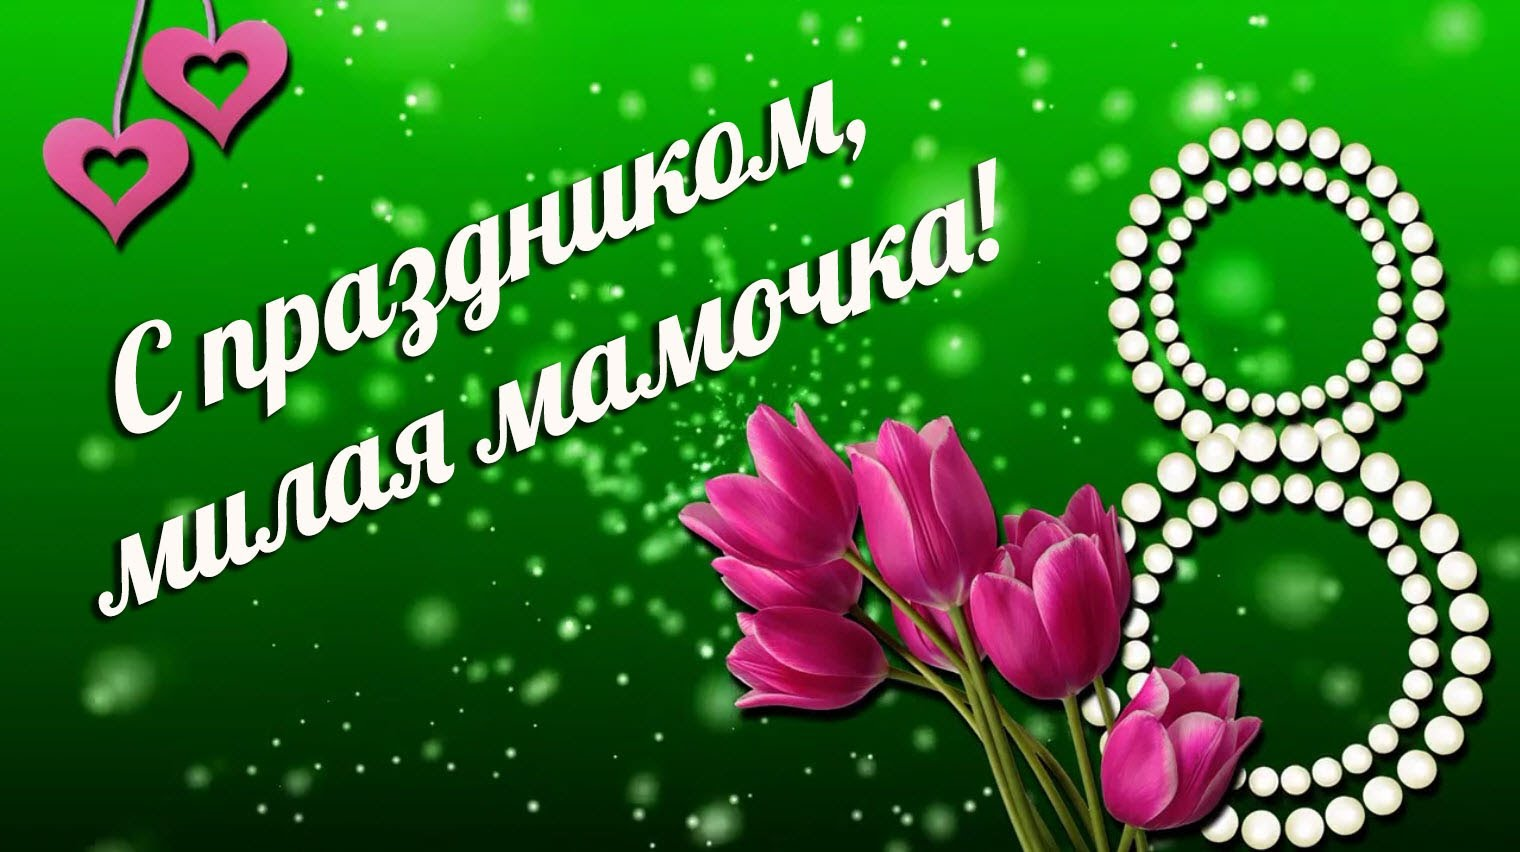 С 8 марта маме открытка